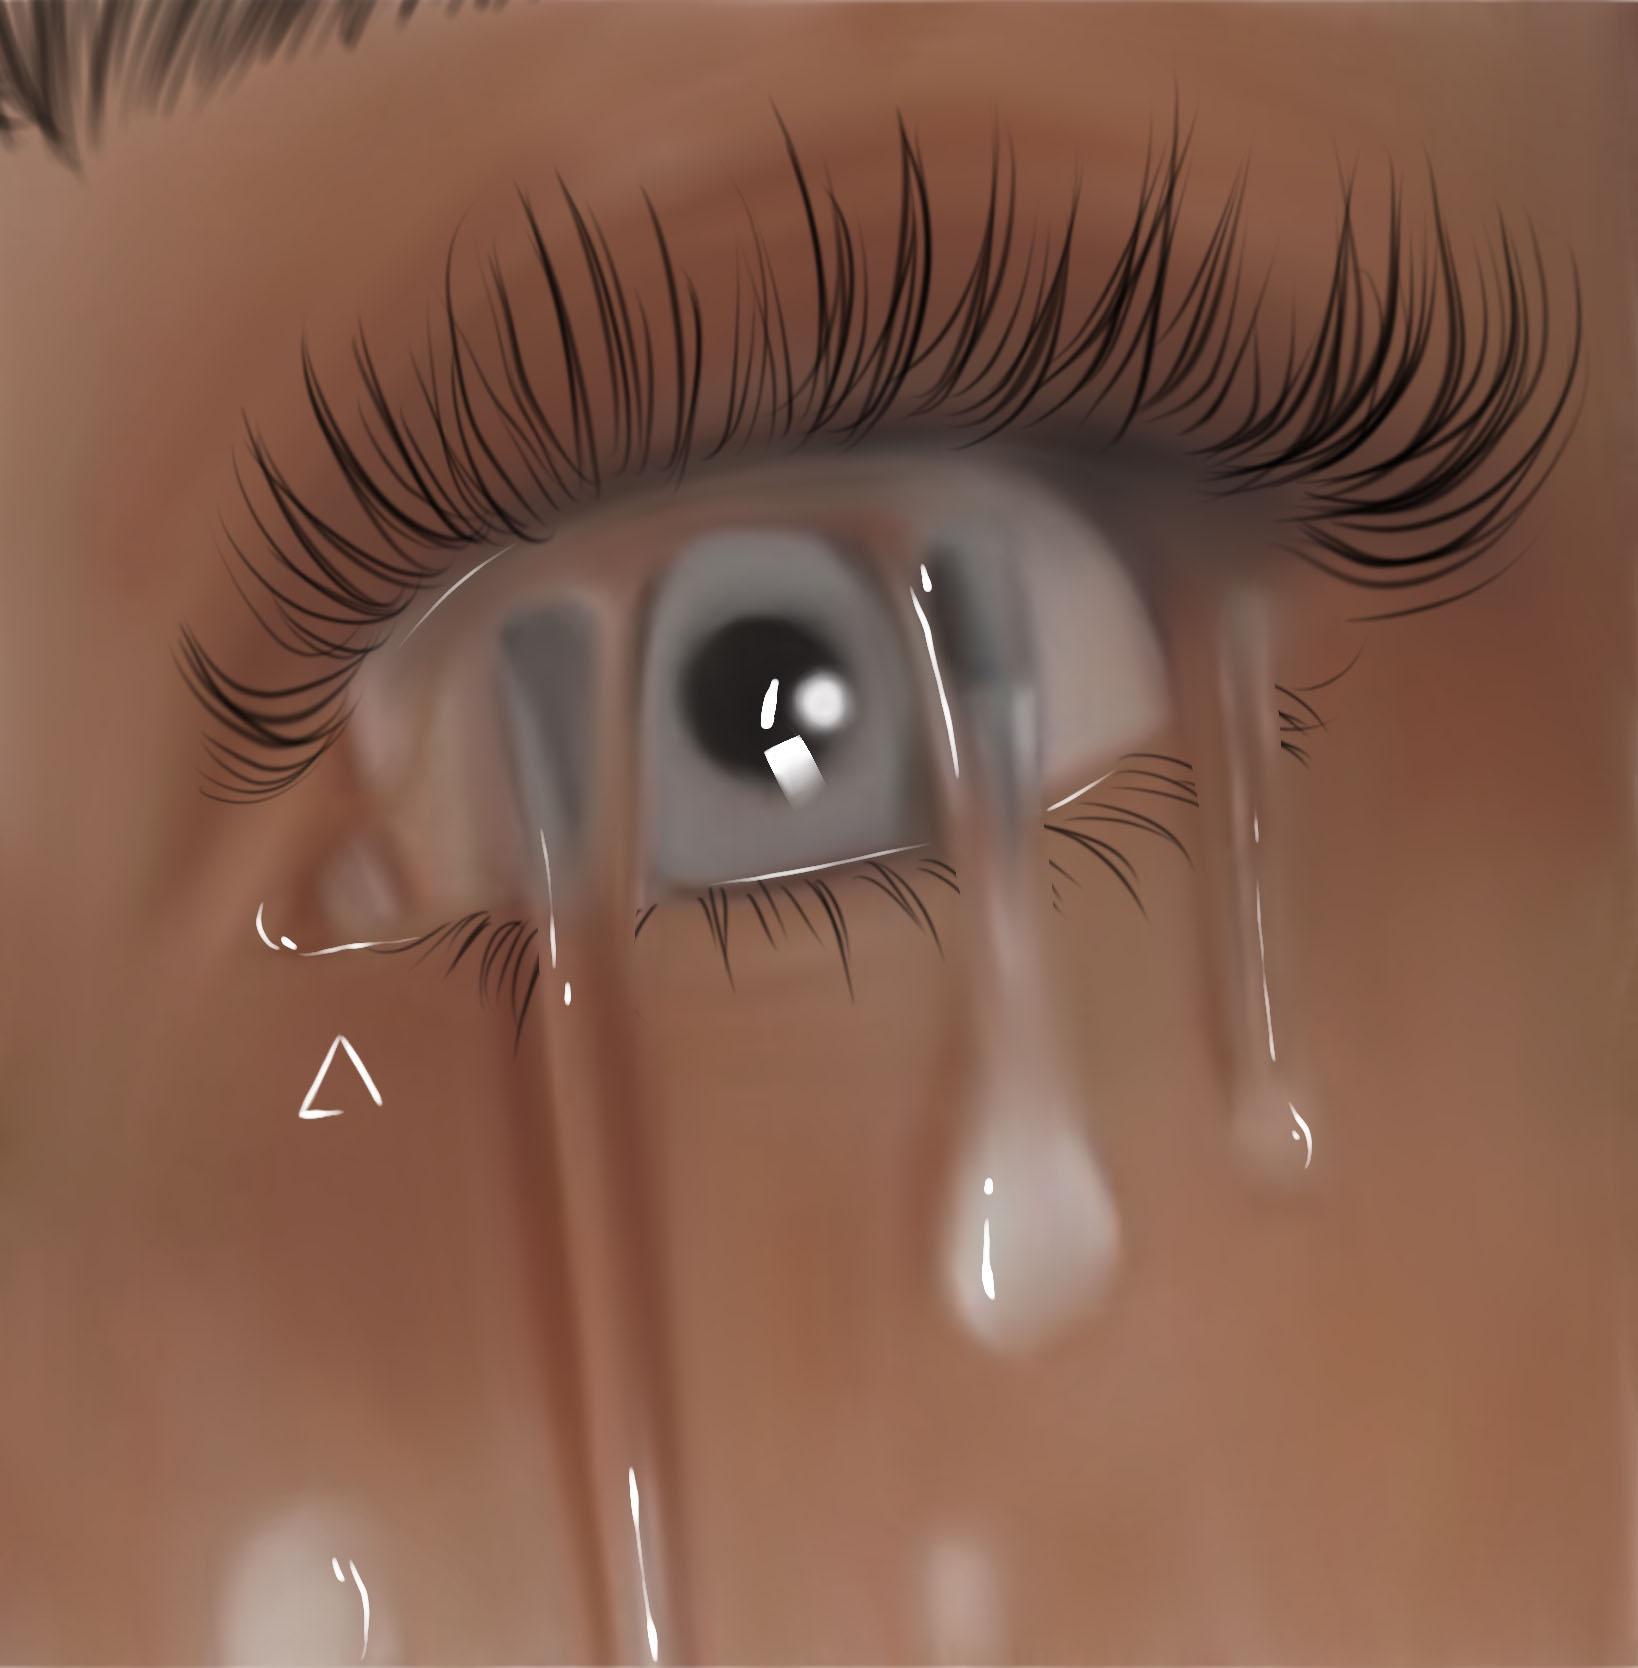 Digital art eye